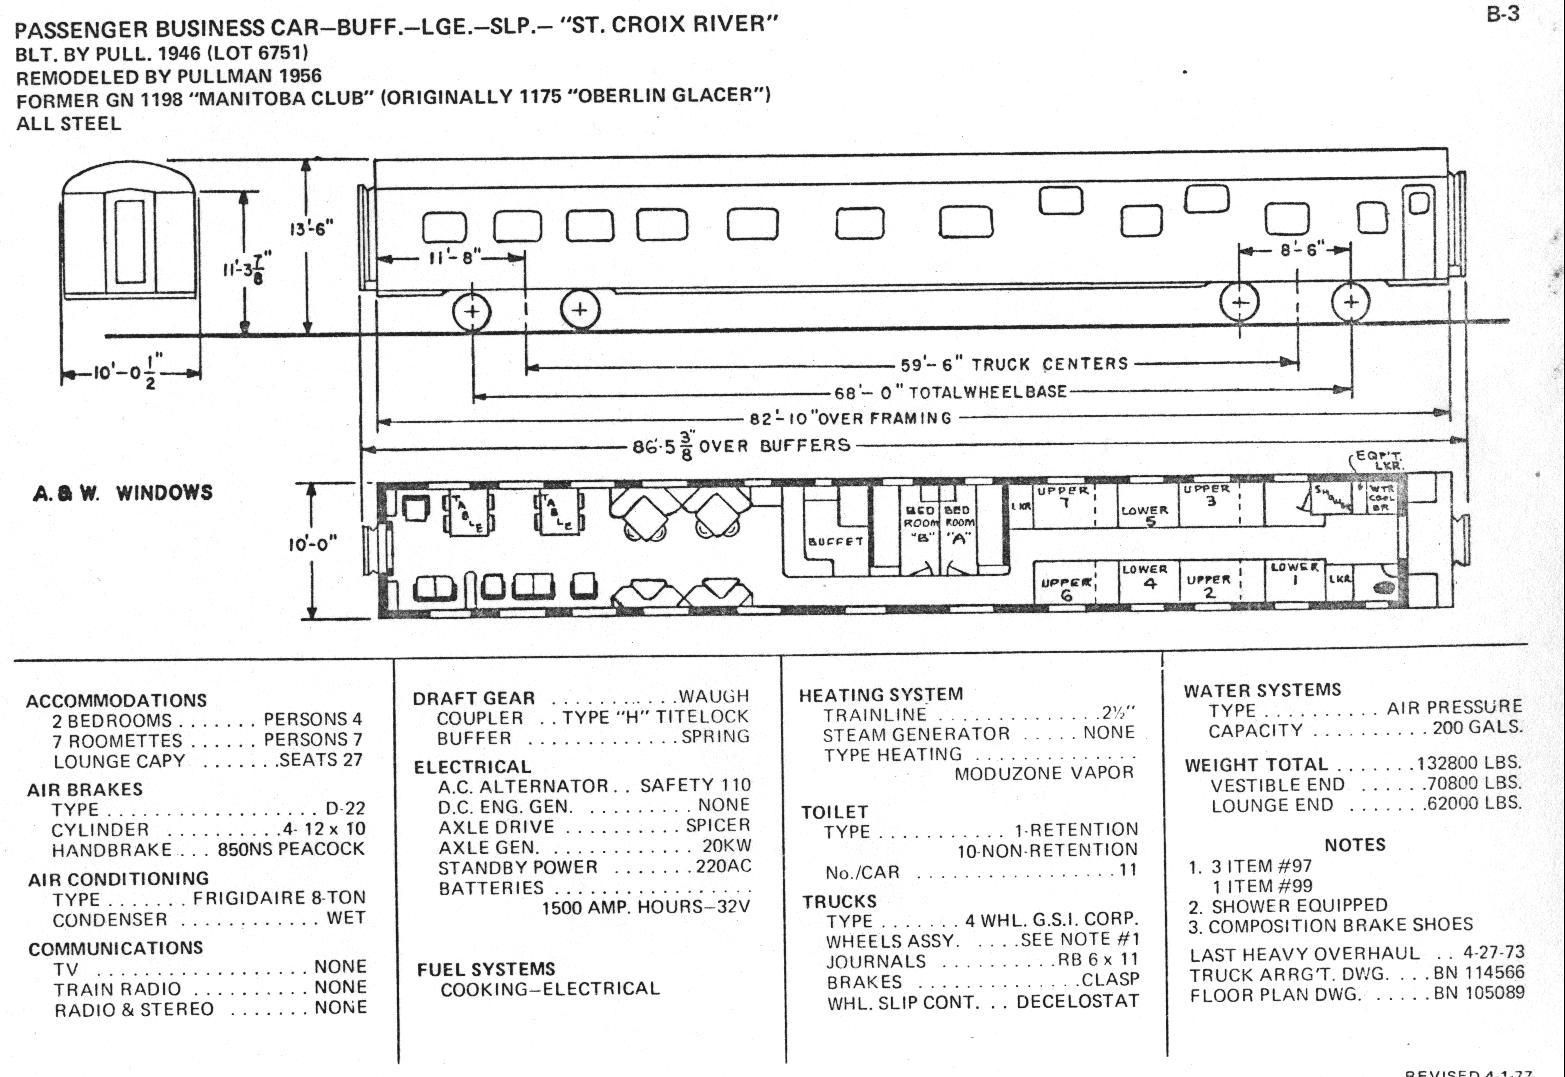 medium resolution of passenger car diagrams diy enthusiasts wiring diagrams 2000 mazda b2500 fuse diagram 1999 mazda b2000 fuel